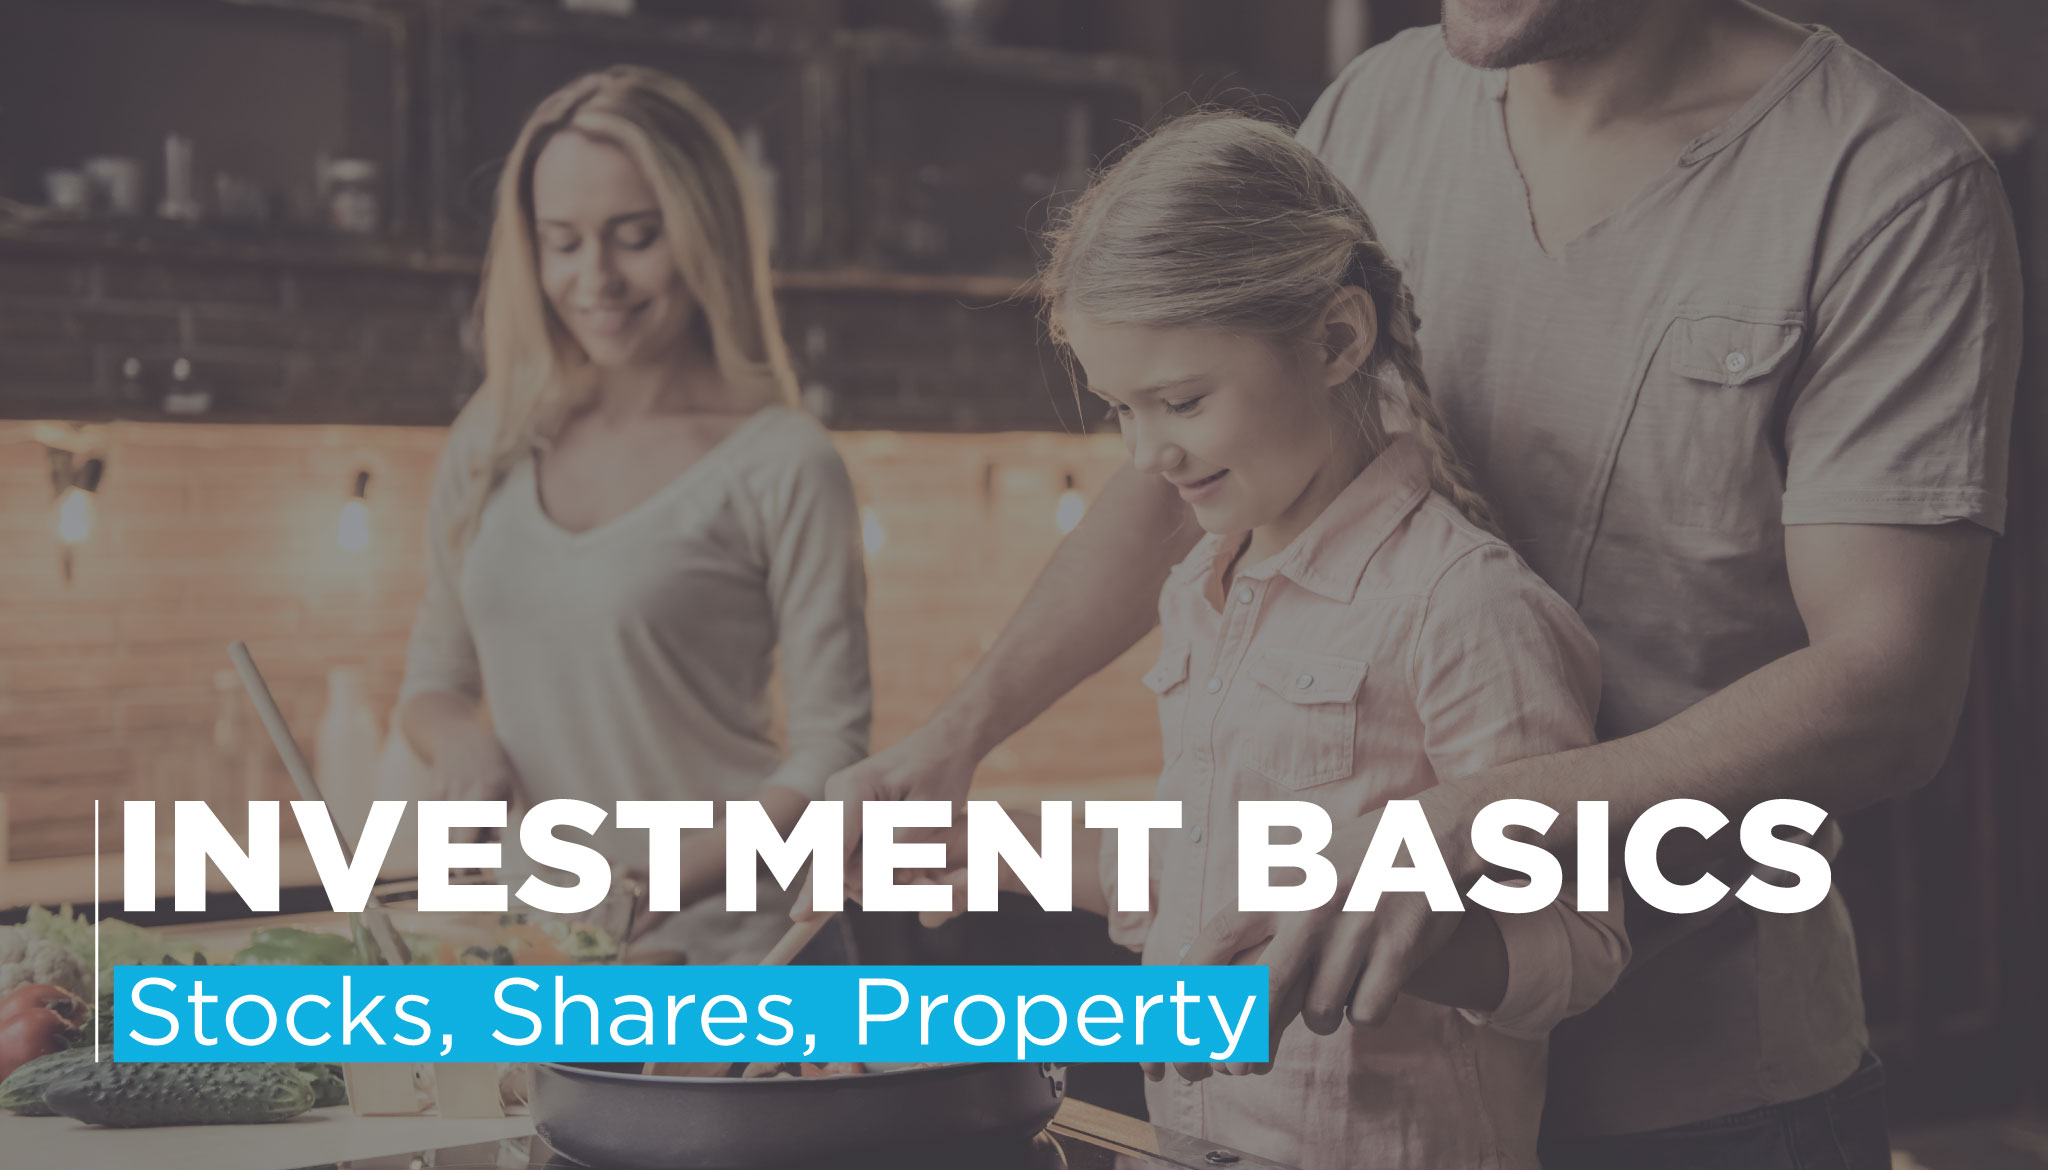 Stocks-Shares-Property.jpg